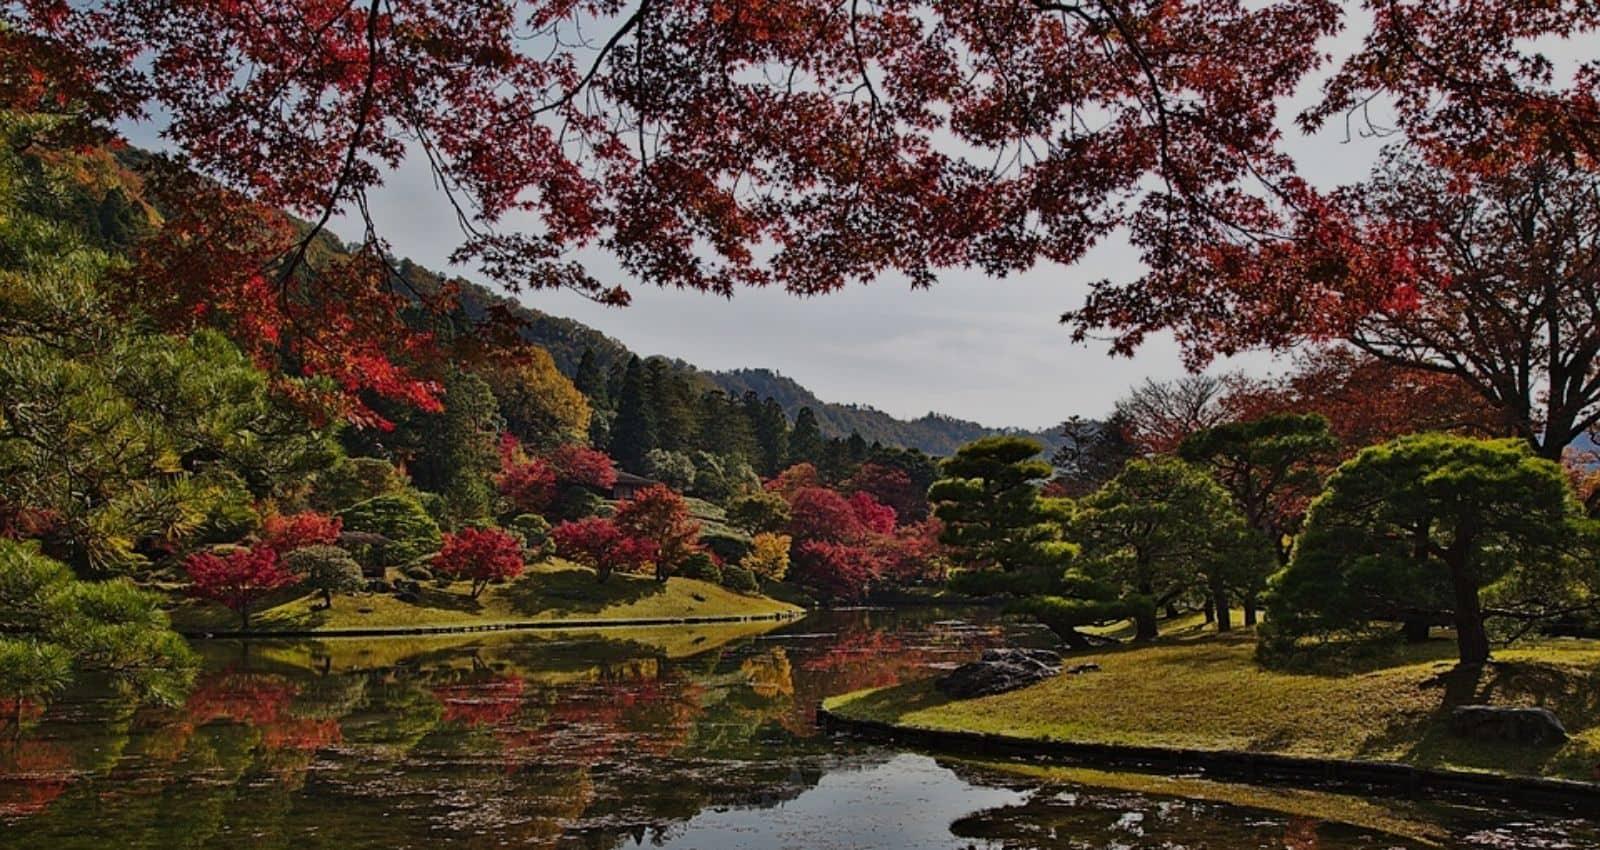 japan-kyoto-park-autumn-leaves